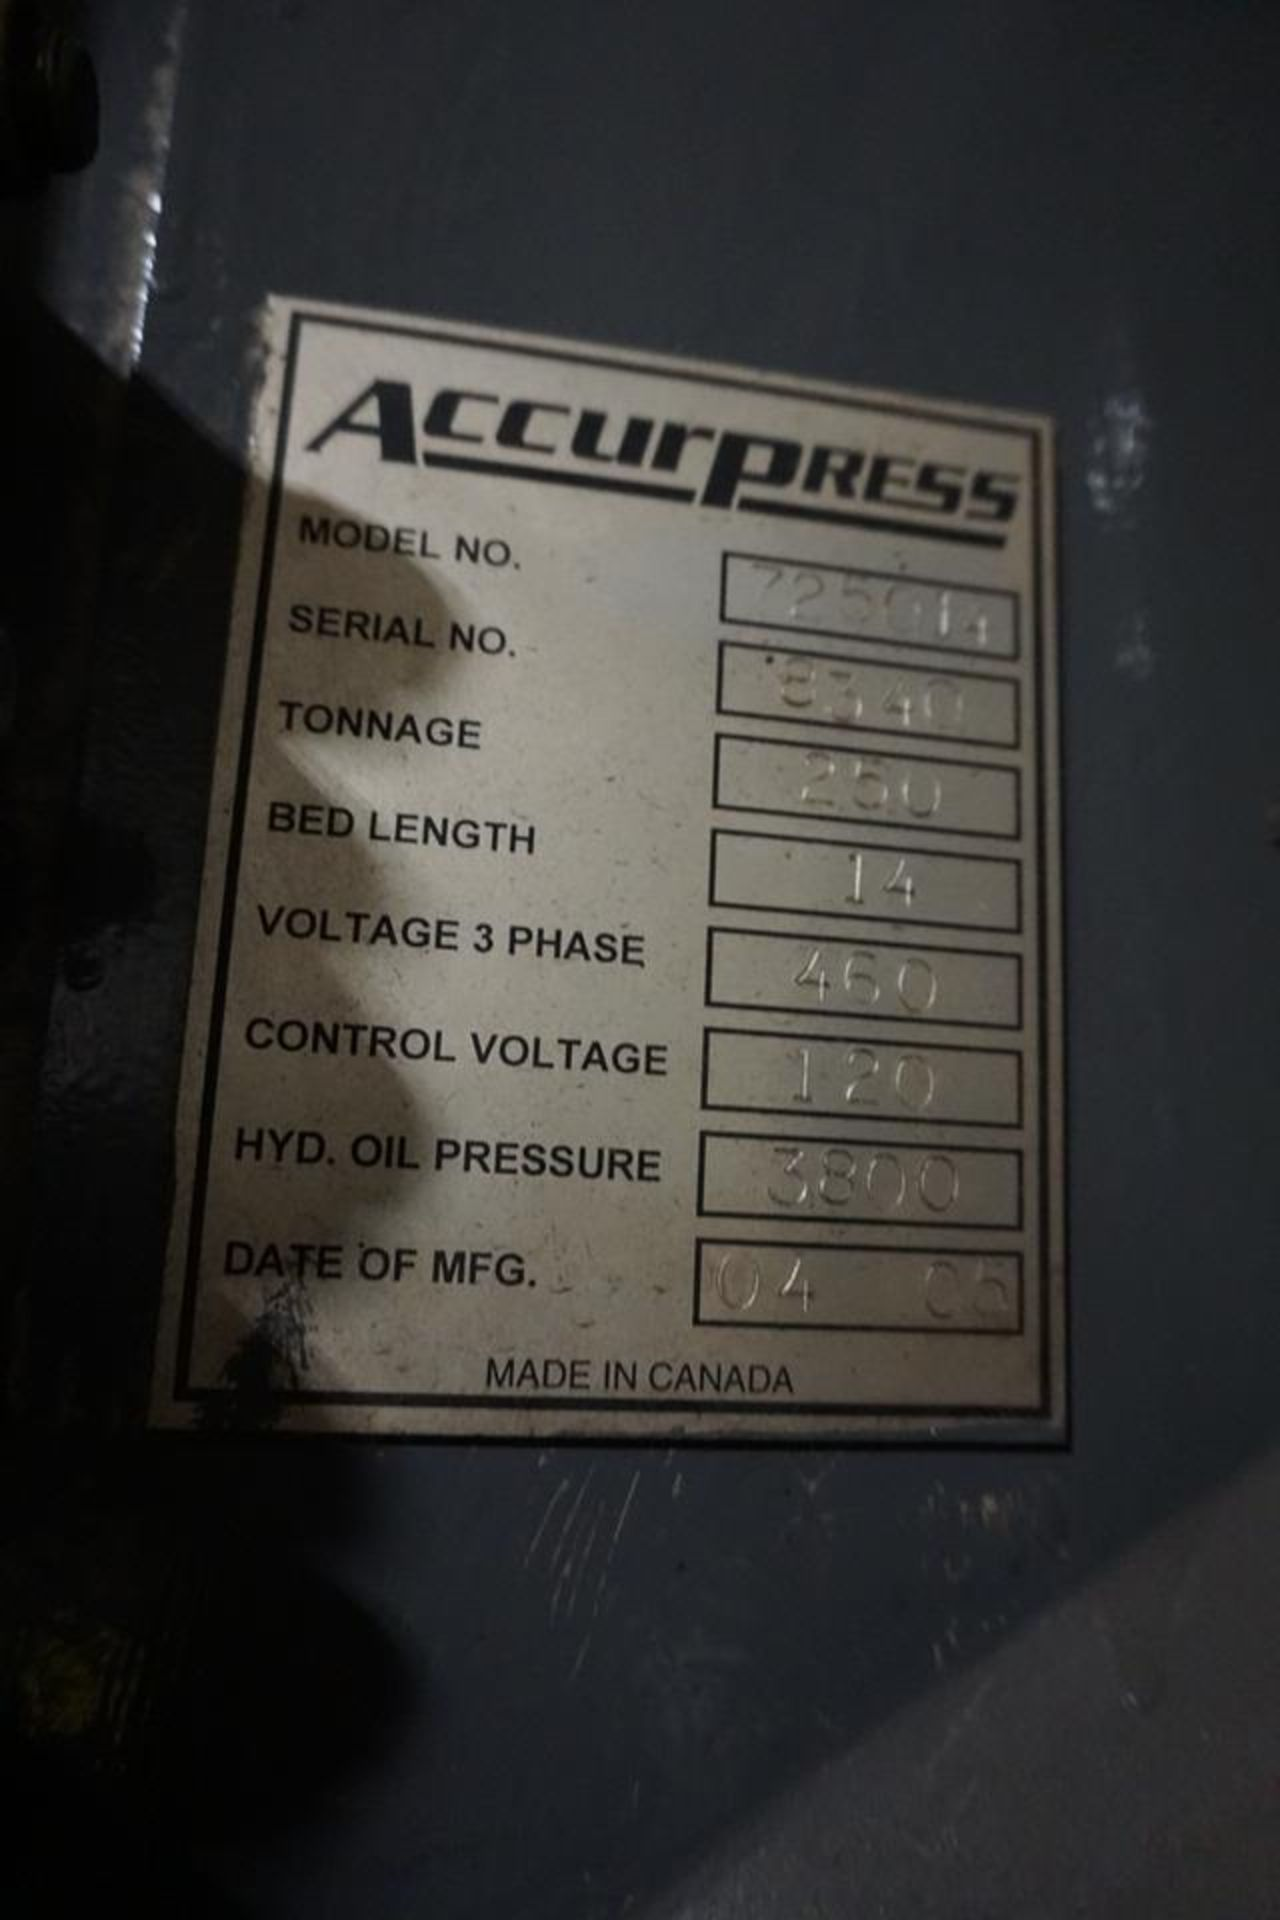 Lot 5 - (2005) 14' X 250 TON ACCURPRESS HYDRAULIC CNC PRESS BRAKE